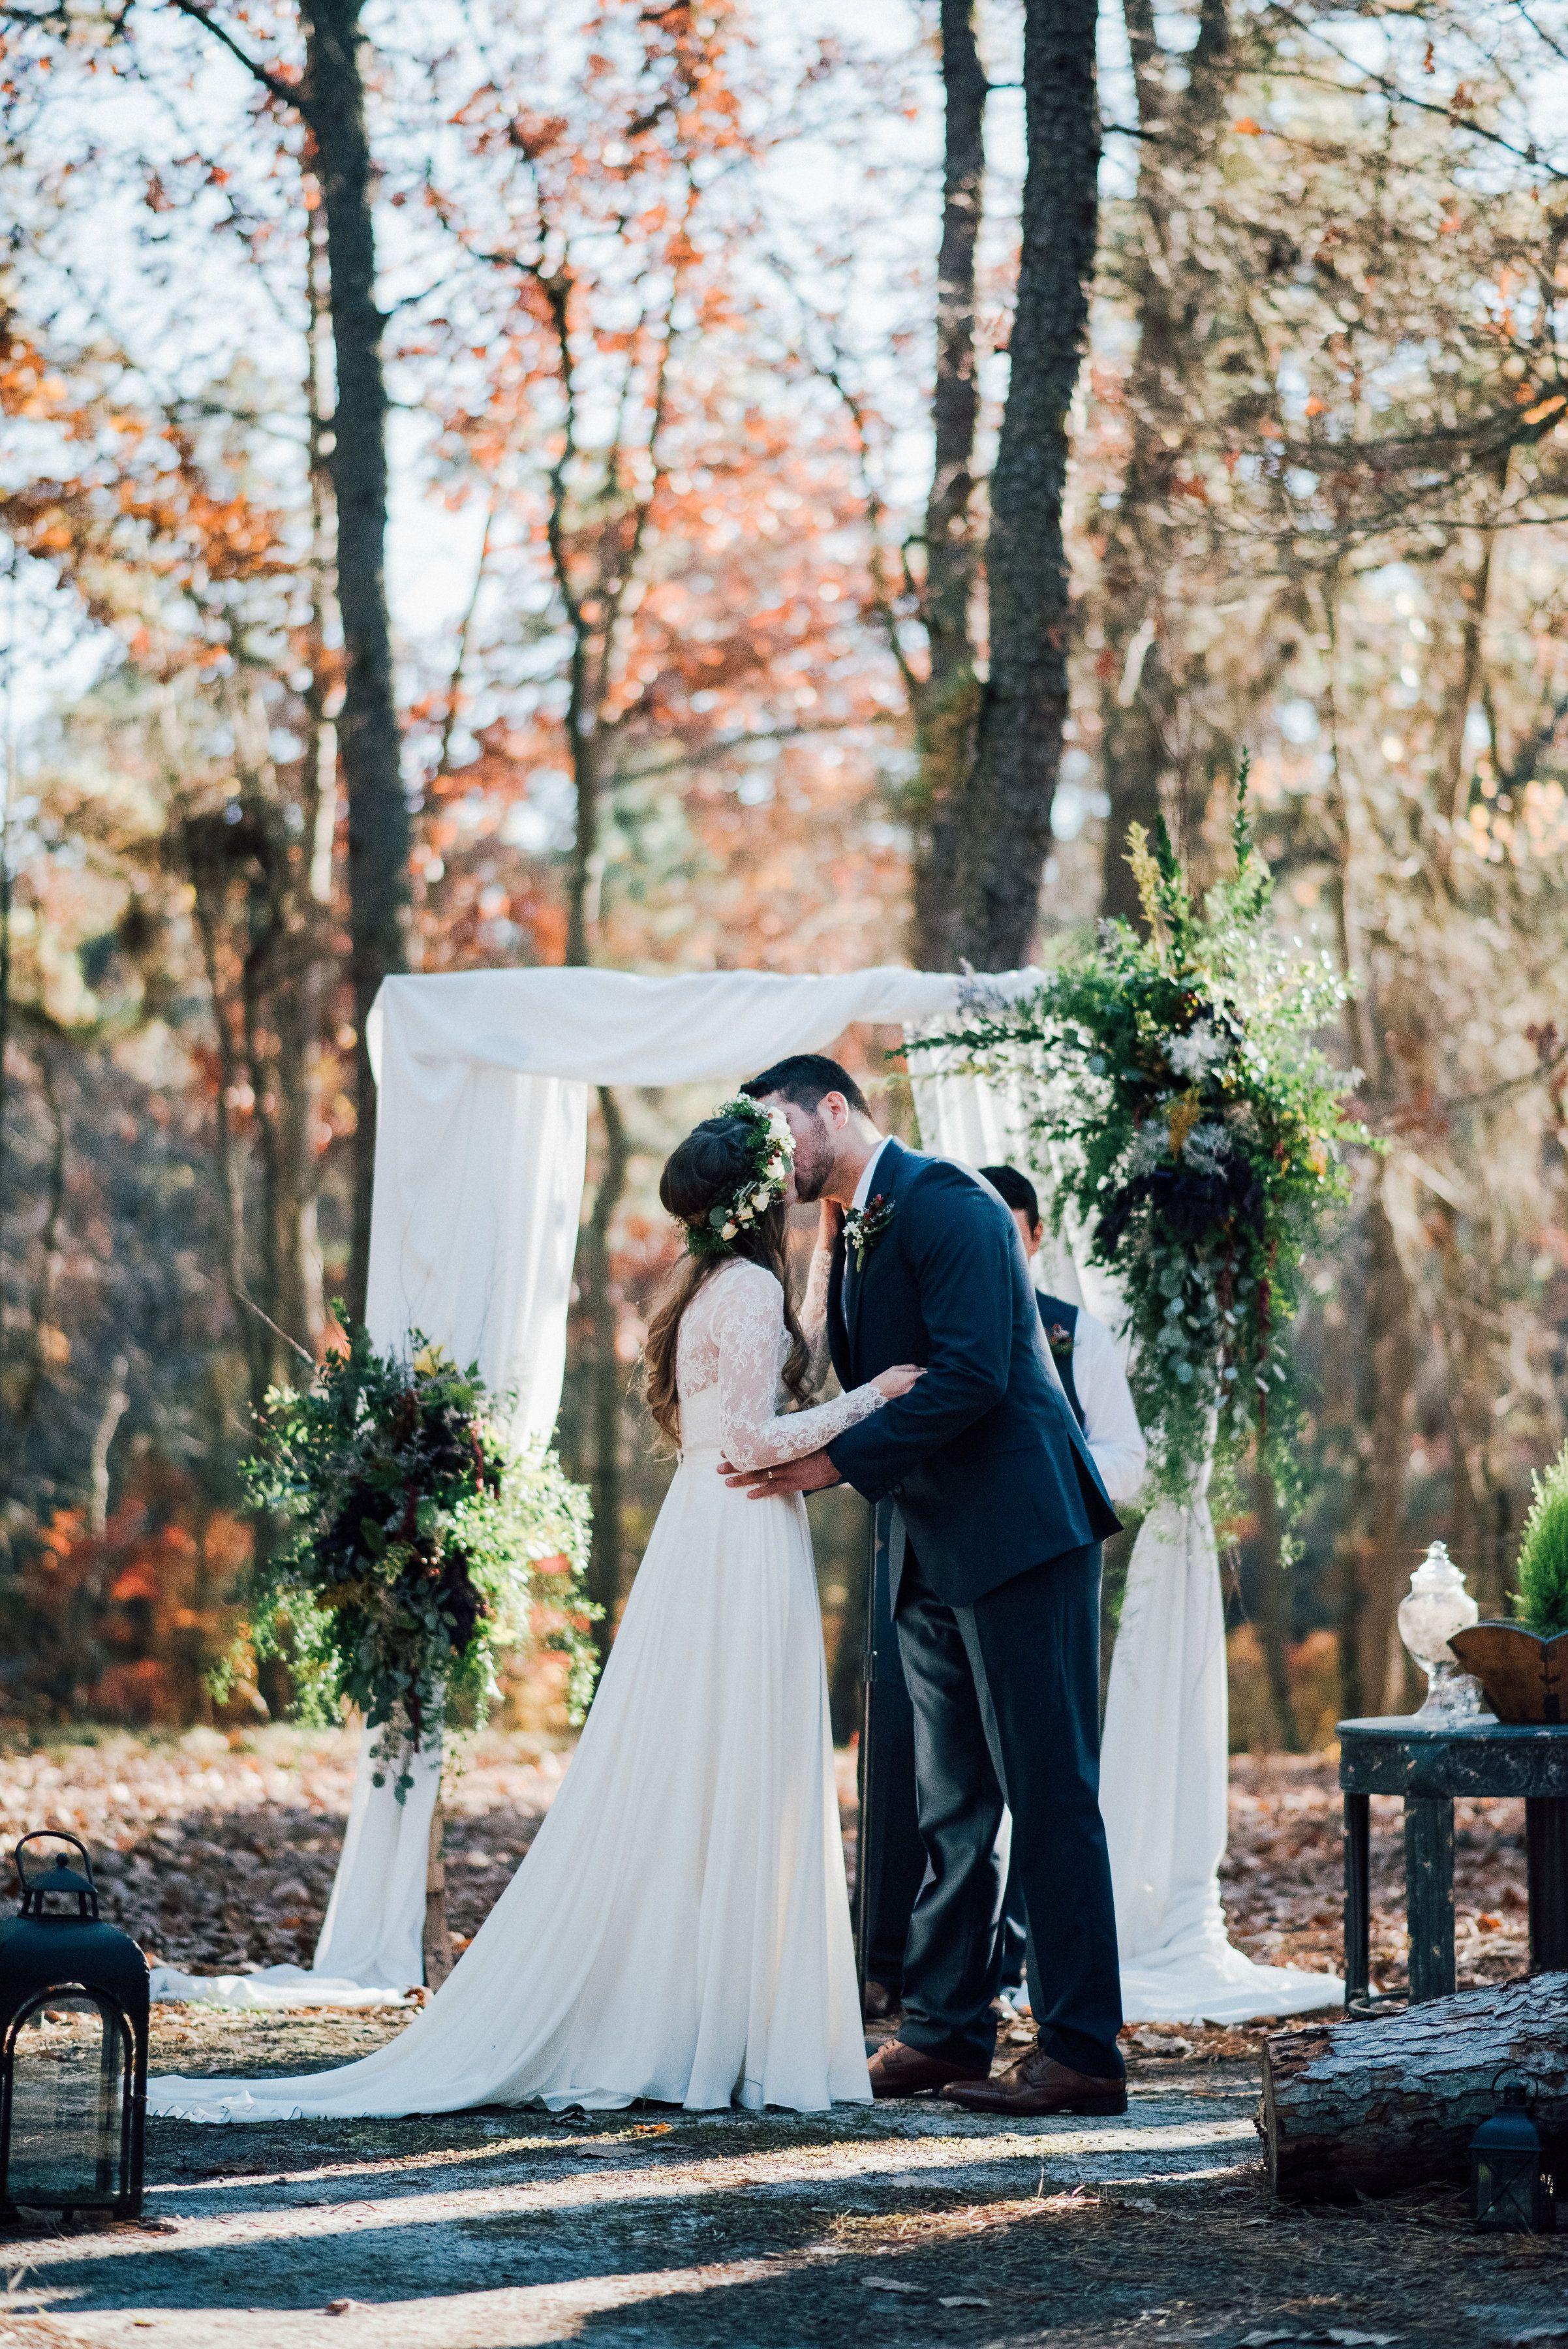 Fall outdoor wedding dresses  Outdoor Fall Wedding Ceremony Arch  Fall Wedding  Bride u Groom